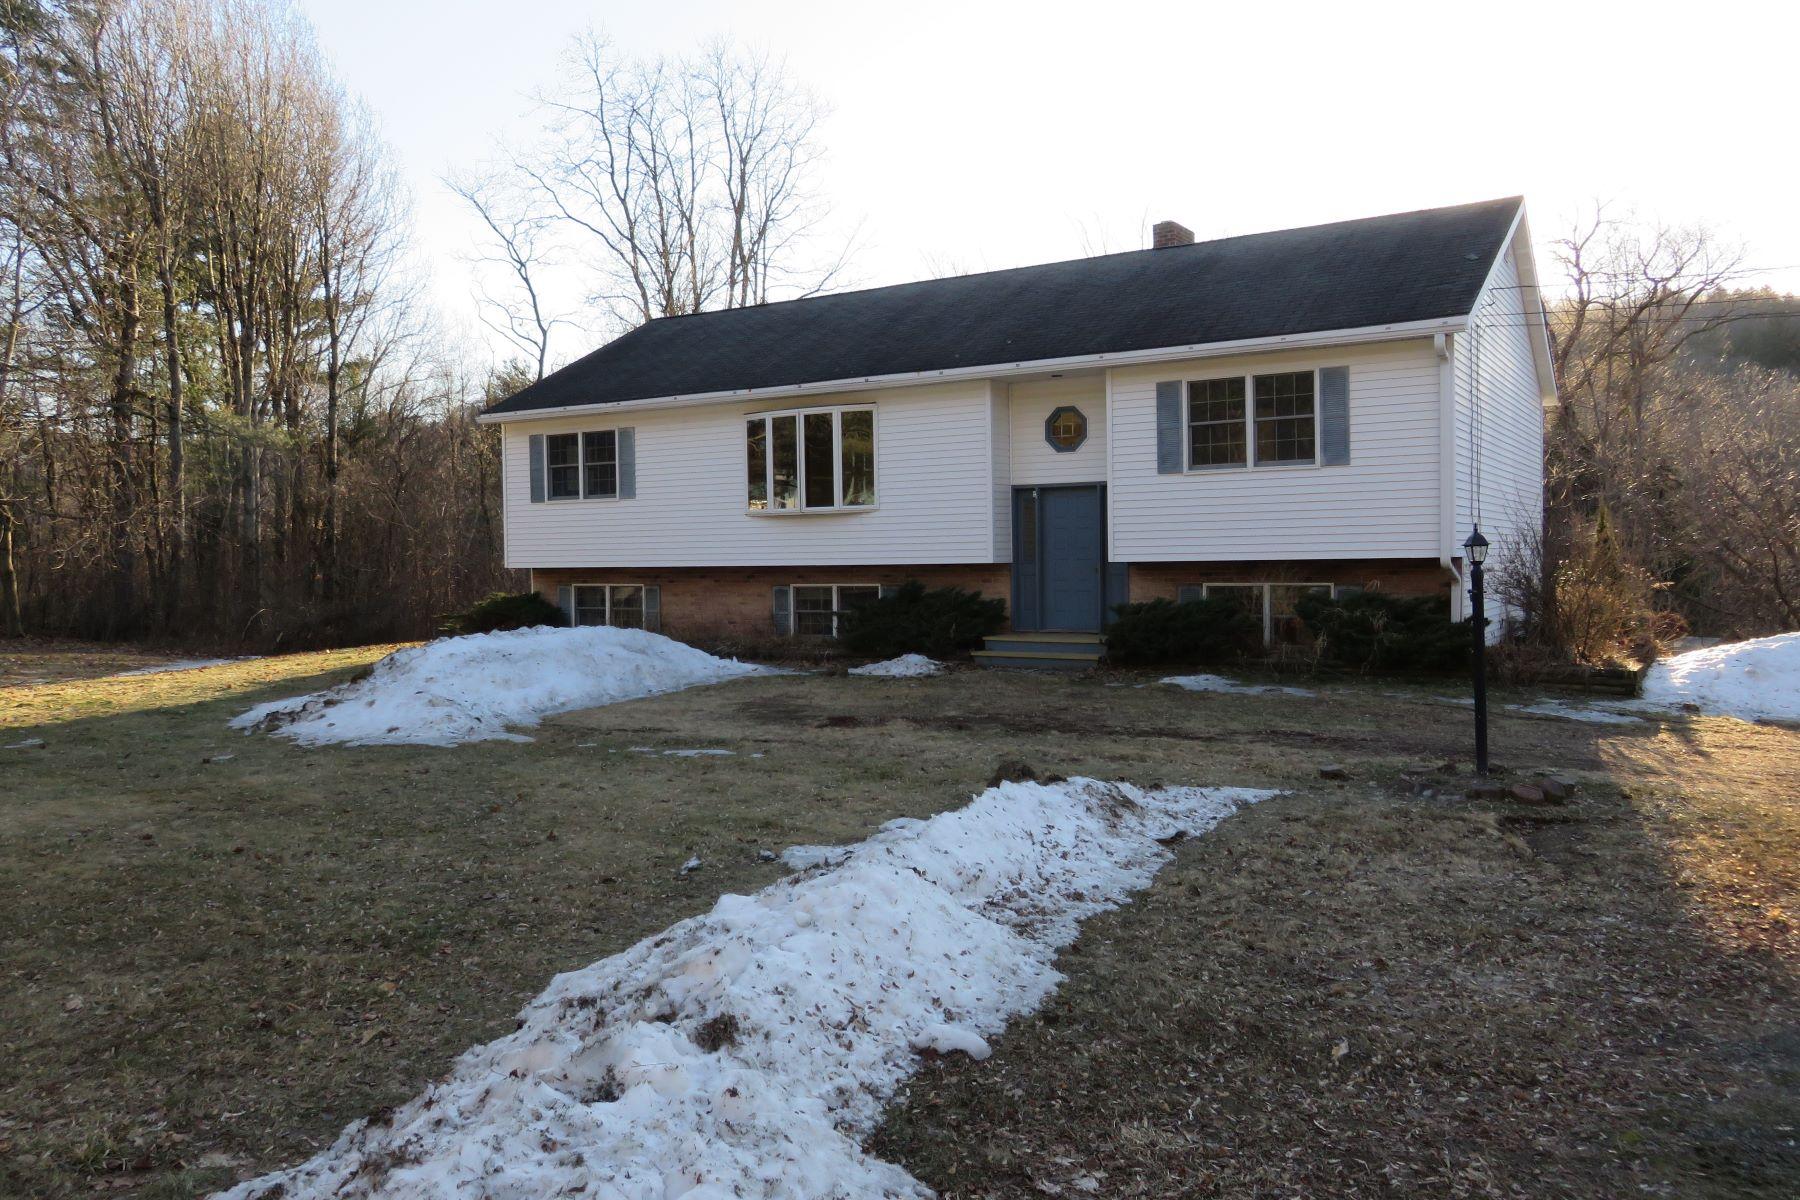 Single Family Home for Sale at 188 Bank Street, Lebanon Lebanon, New Hampshire, 03766 United States